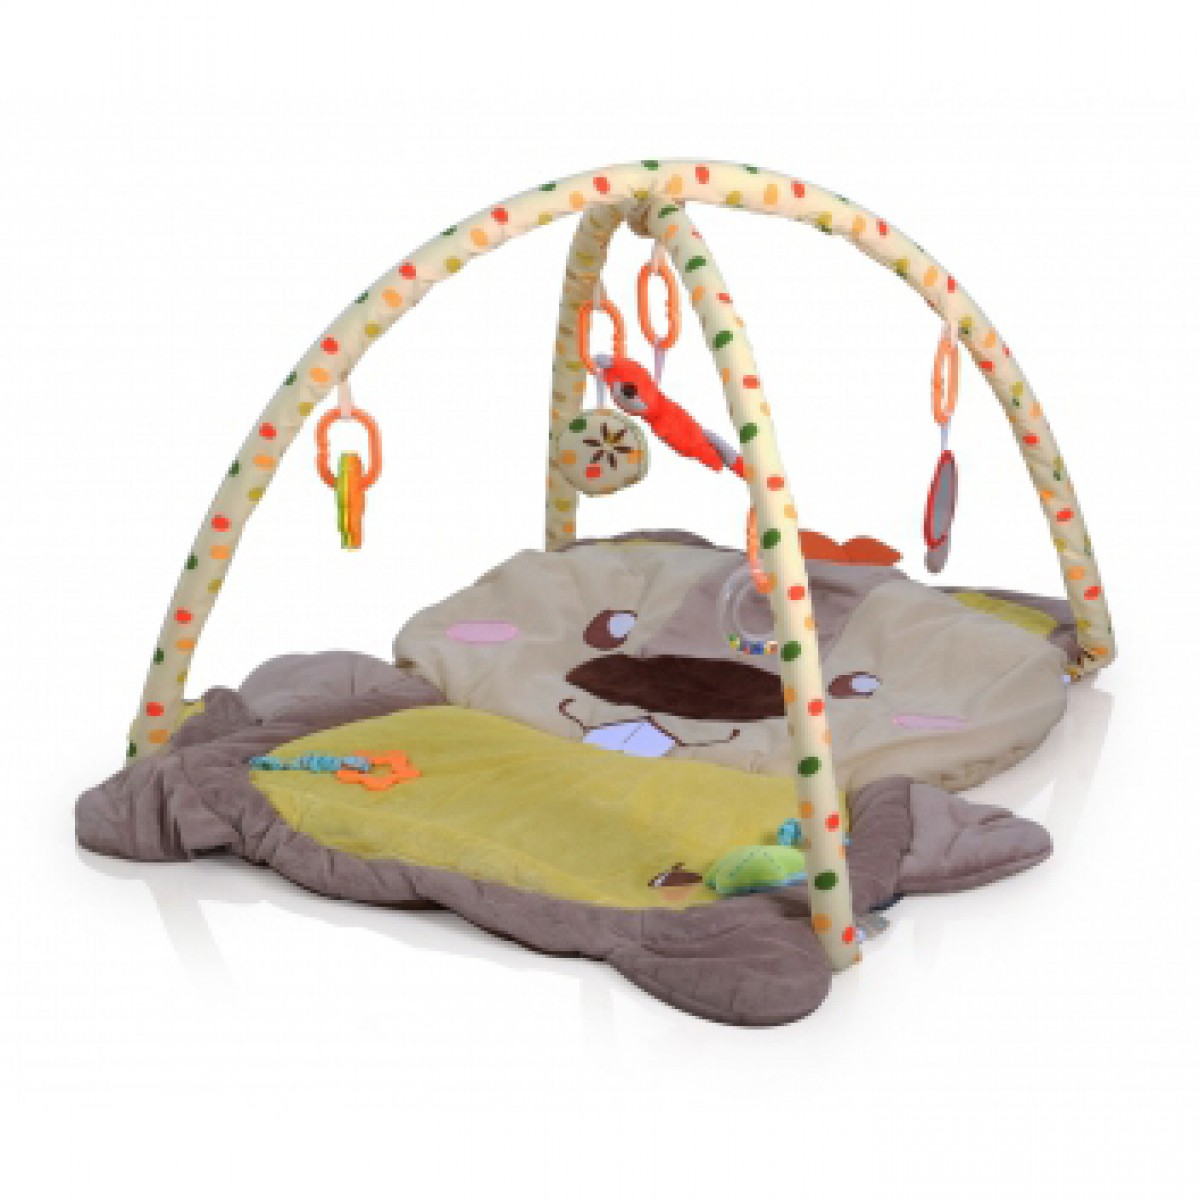 (Q/3327C-3874) Playmat- Squirrel - Kico Baby Center